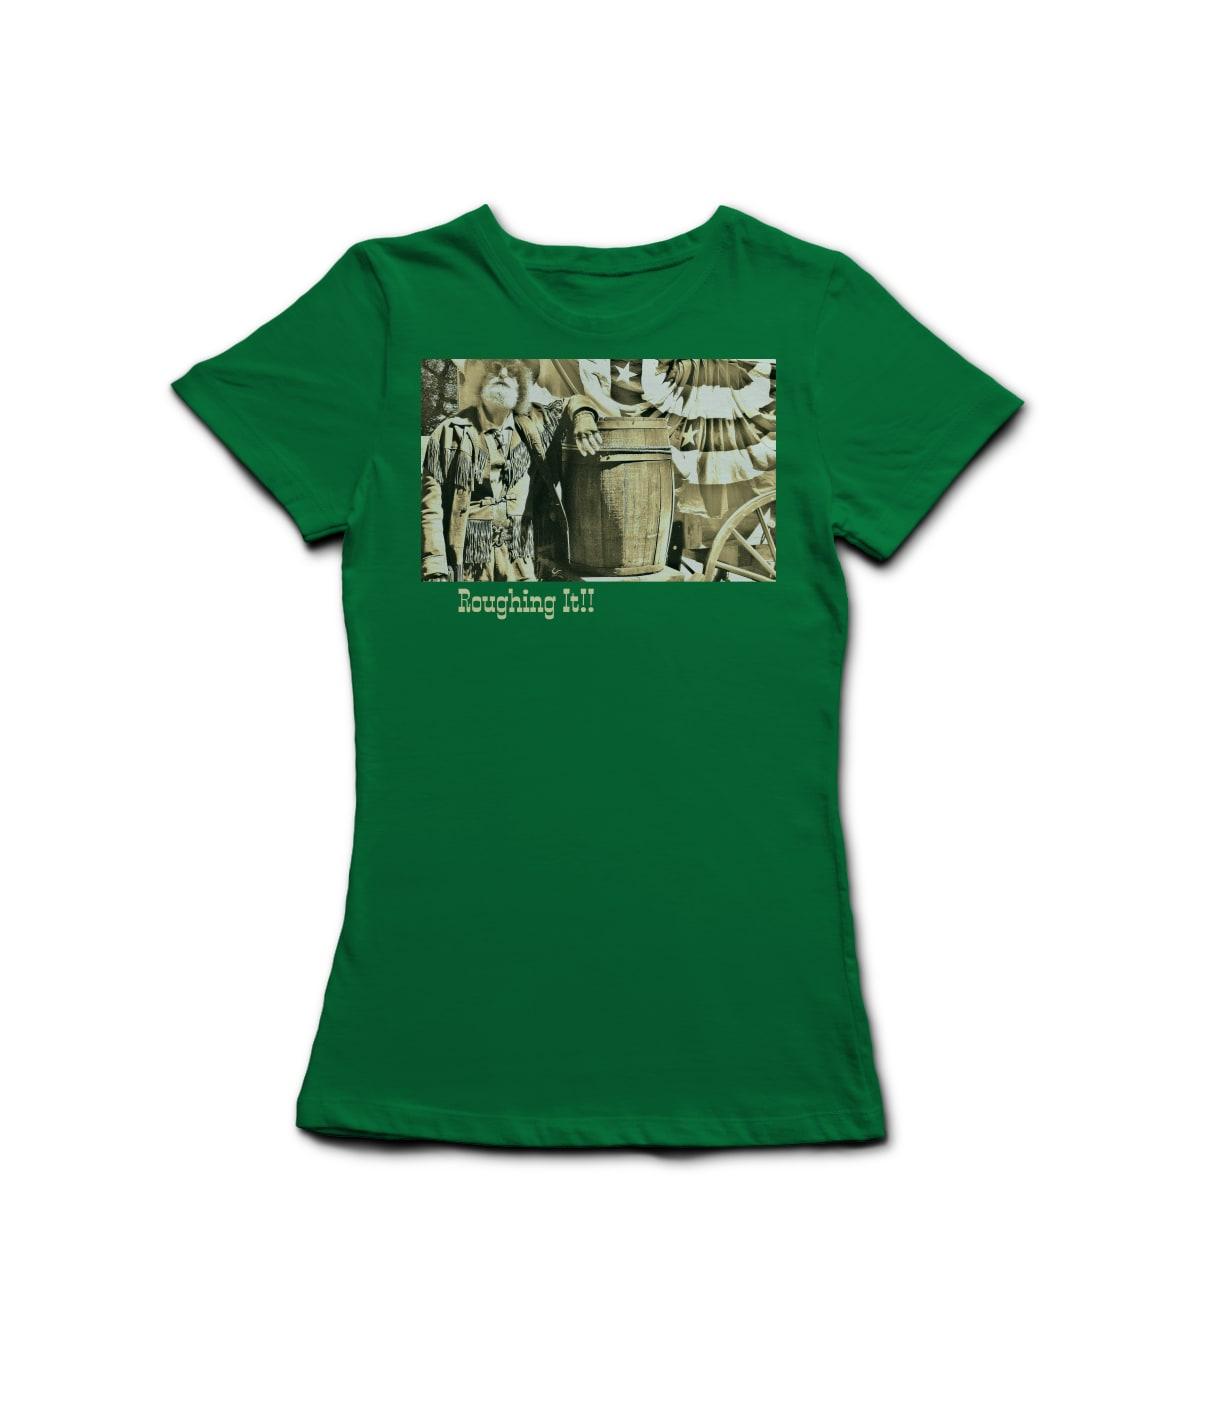 L t shirt green kfkp9a